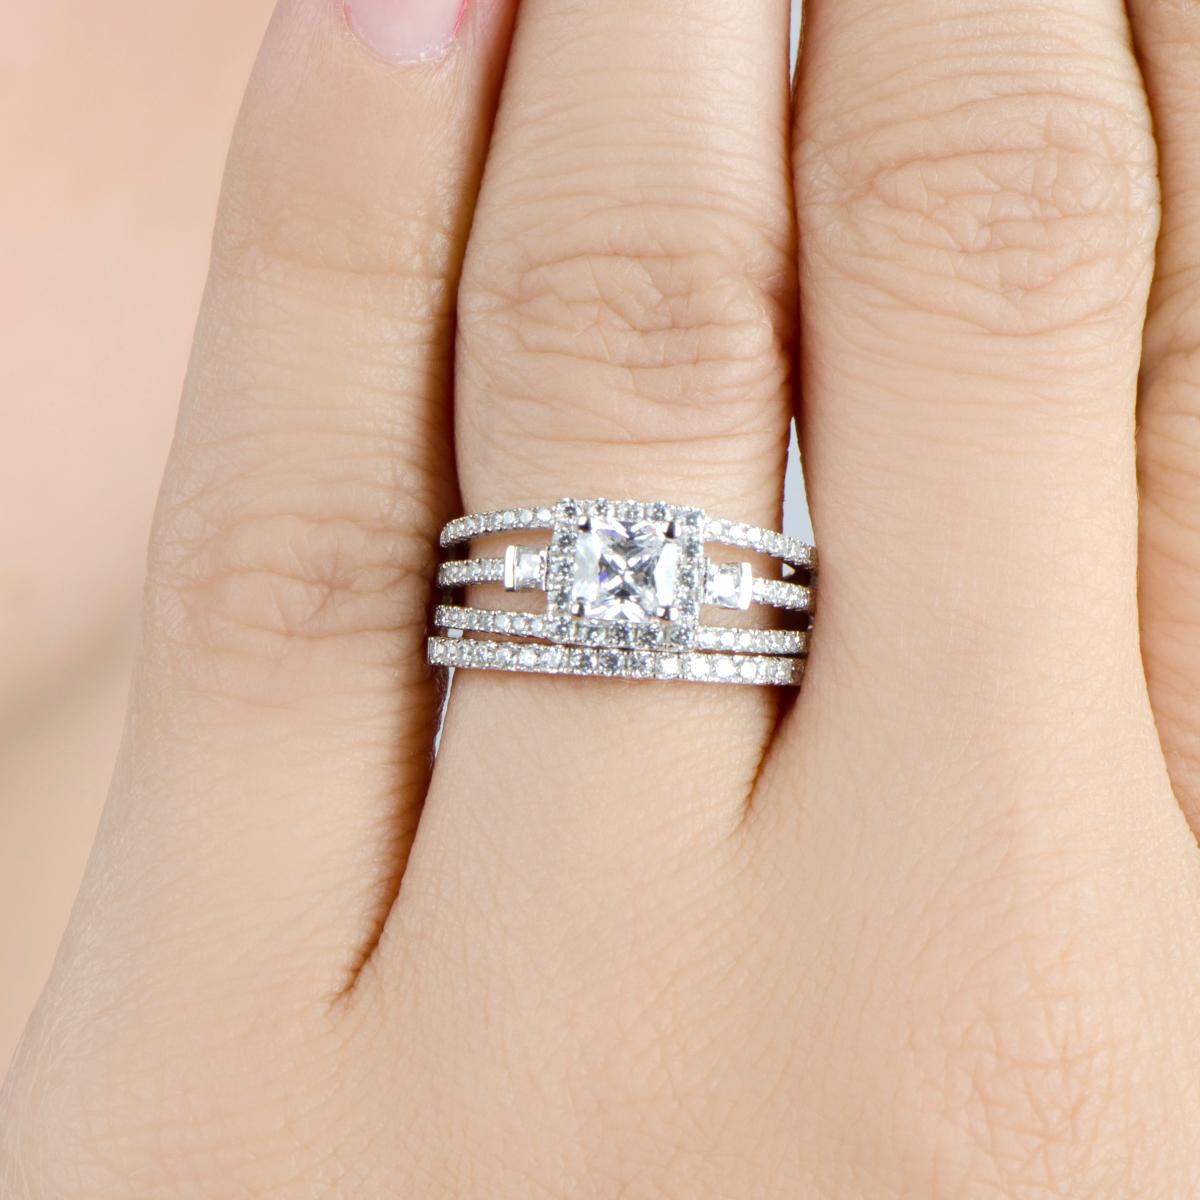 3 Stone Princess Cut Diamond Wedding Anniversary Ring Band Set 925